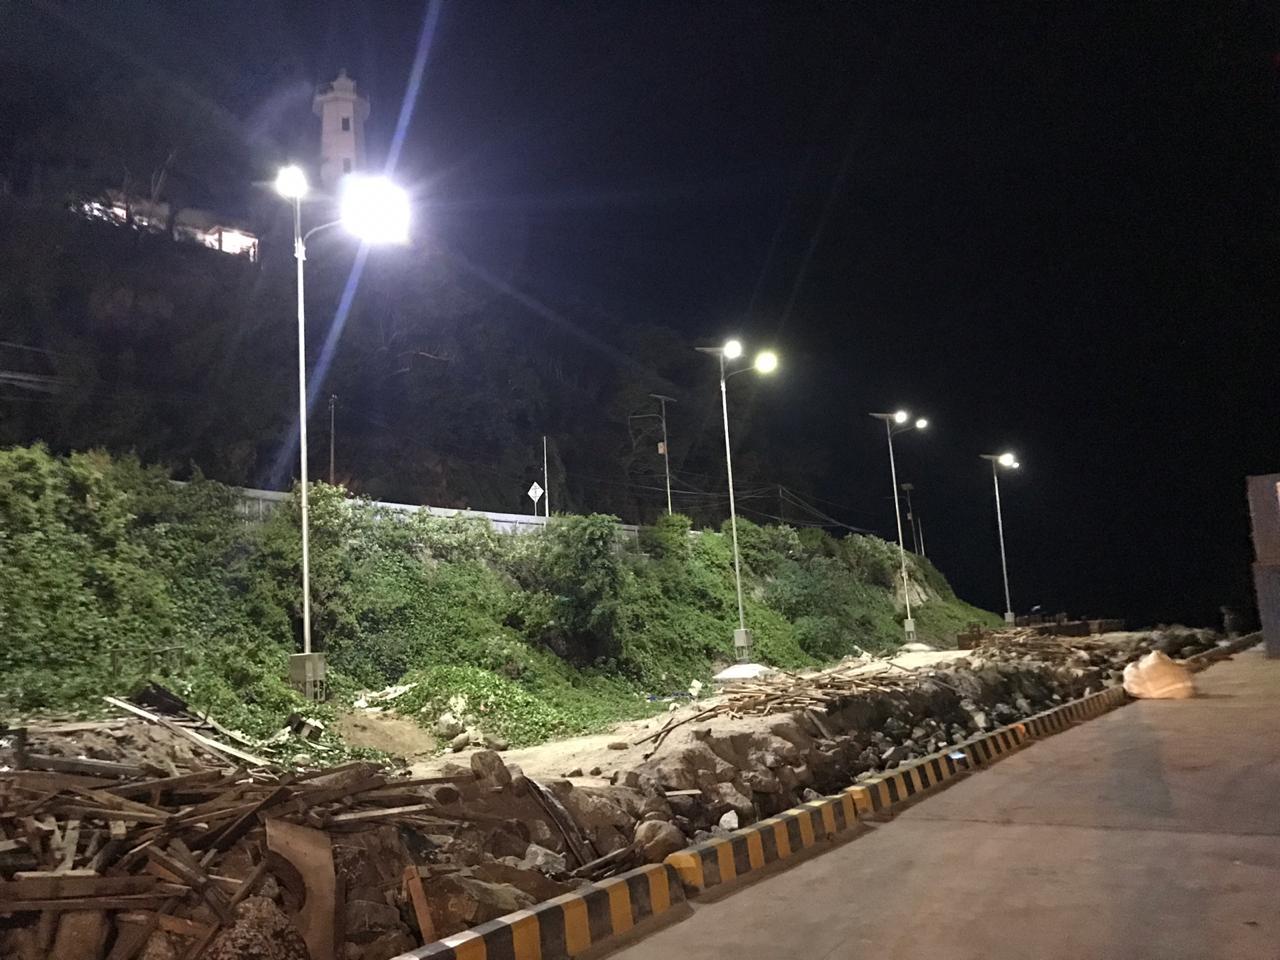 Lampu Penerangan Jalan Tenaga Surya (PJUTS) di Dermaga Gorontalo